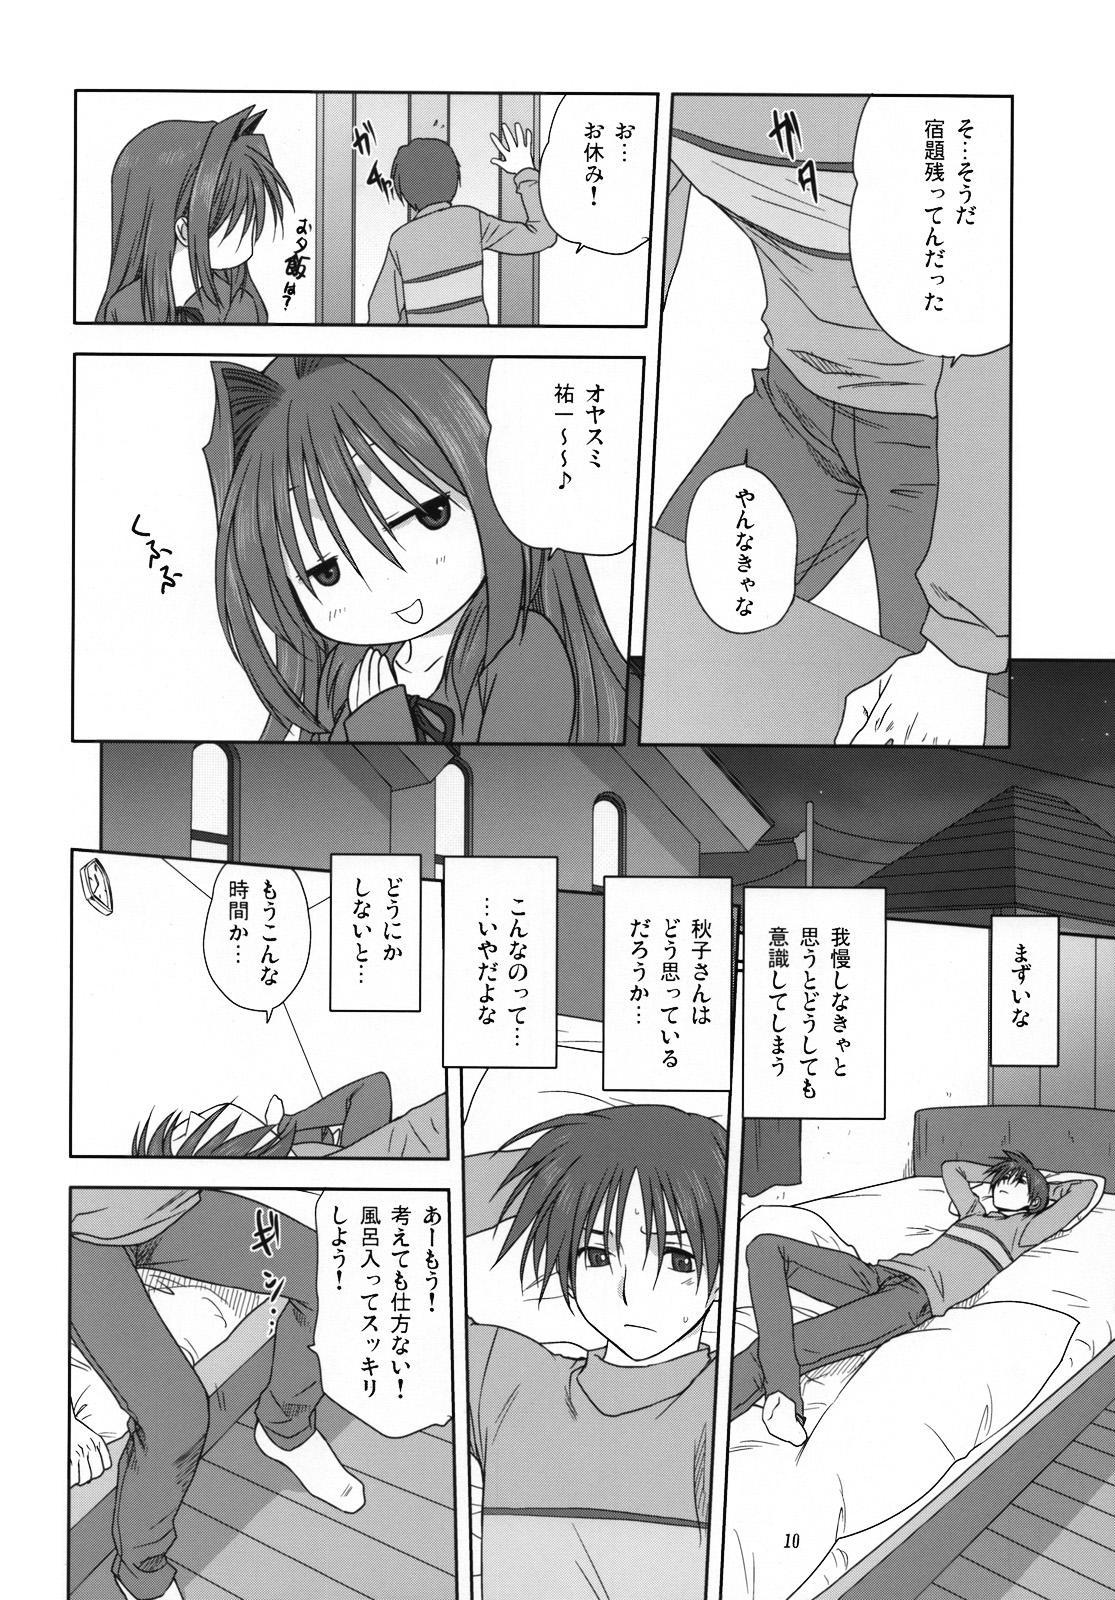 Akiko-san to Issho 3 8